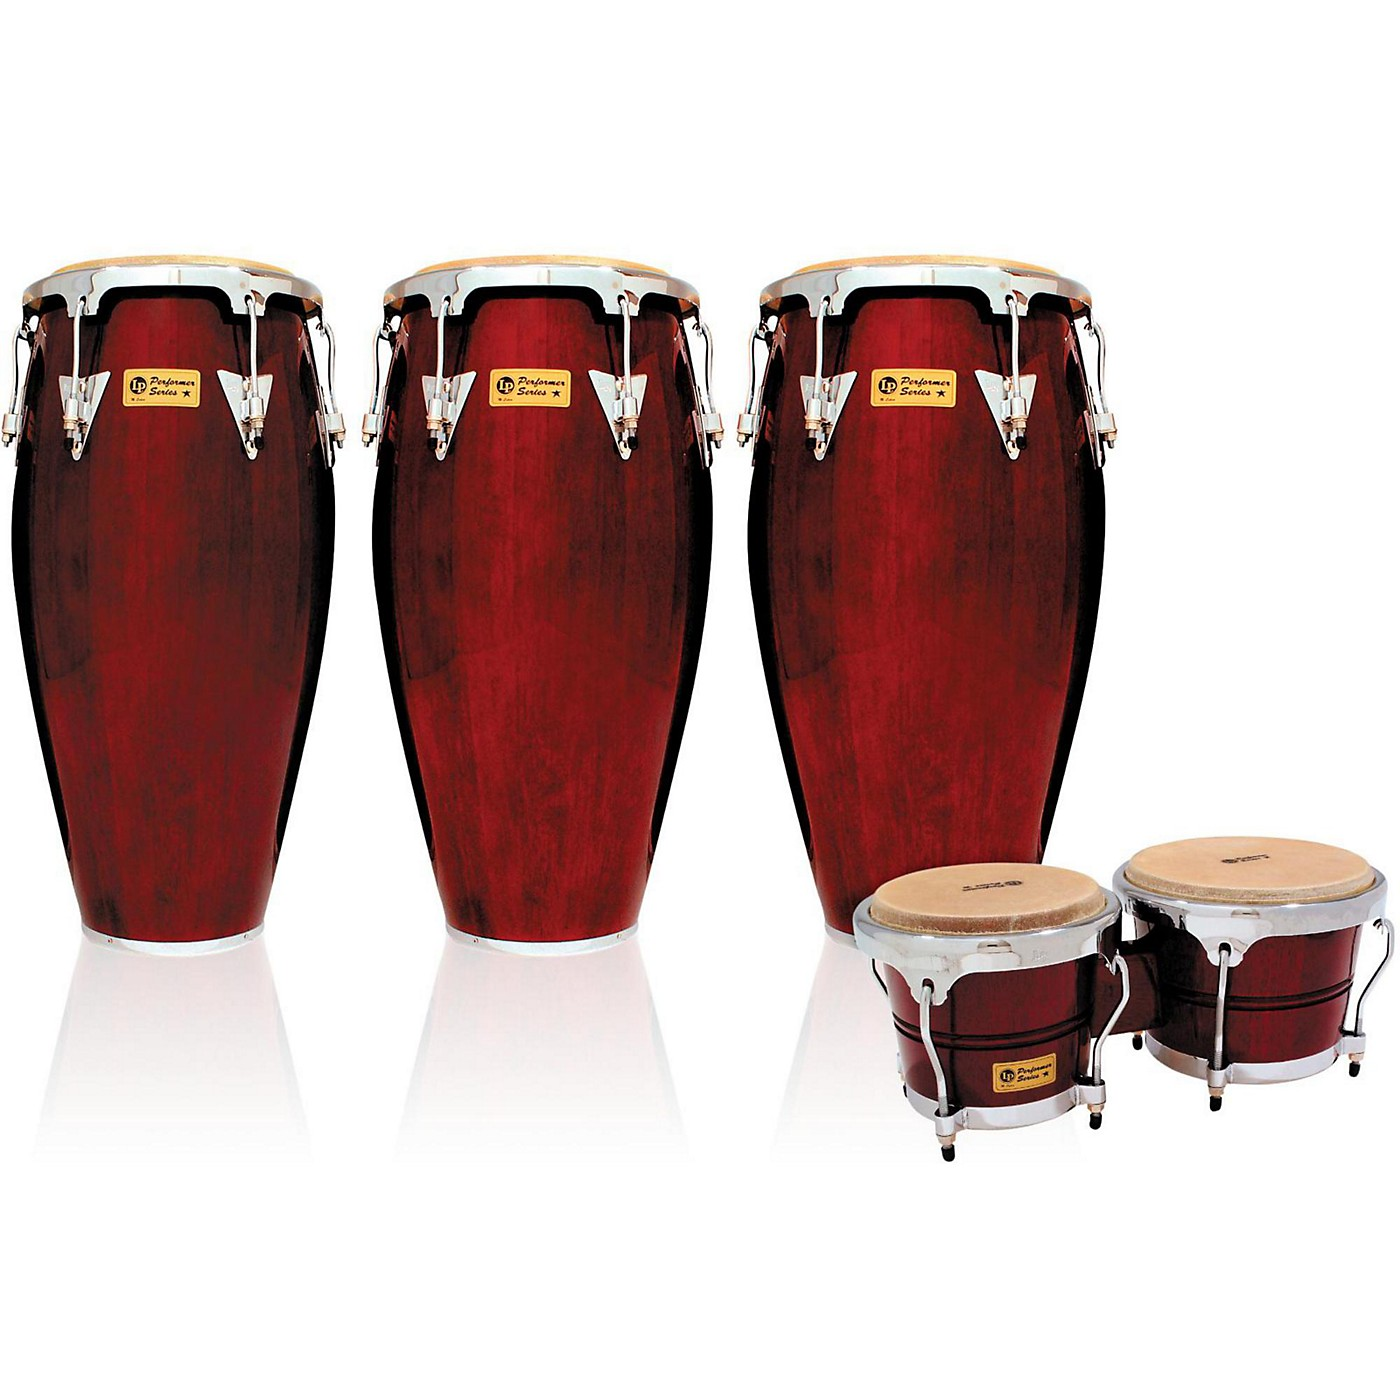 LP Performer Series 3-Piece Conga and Bongo Set with Chrome Hardware thumbnail